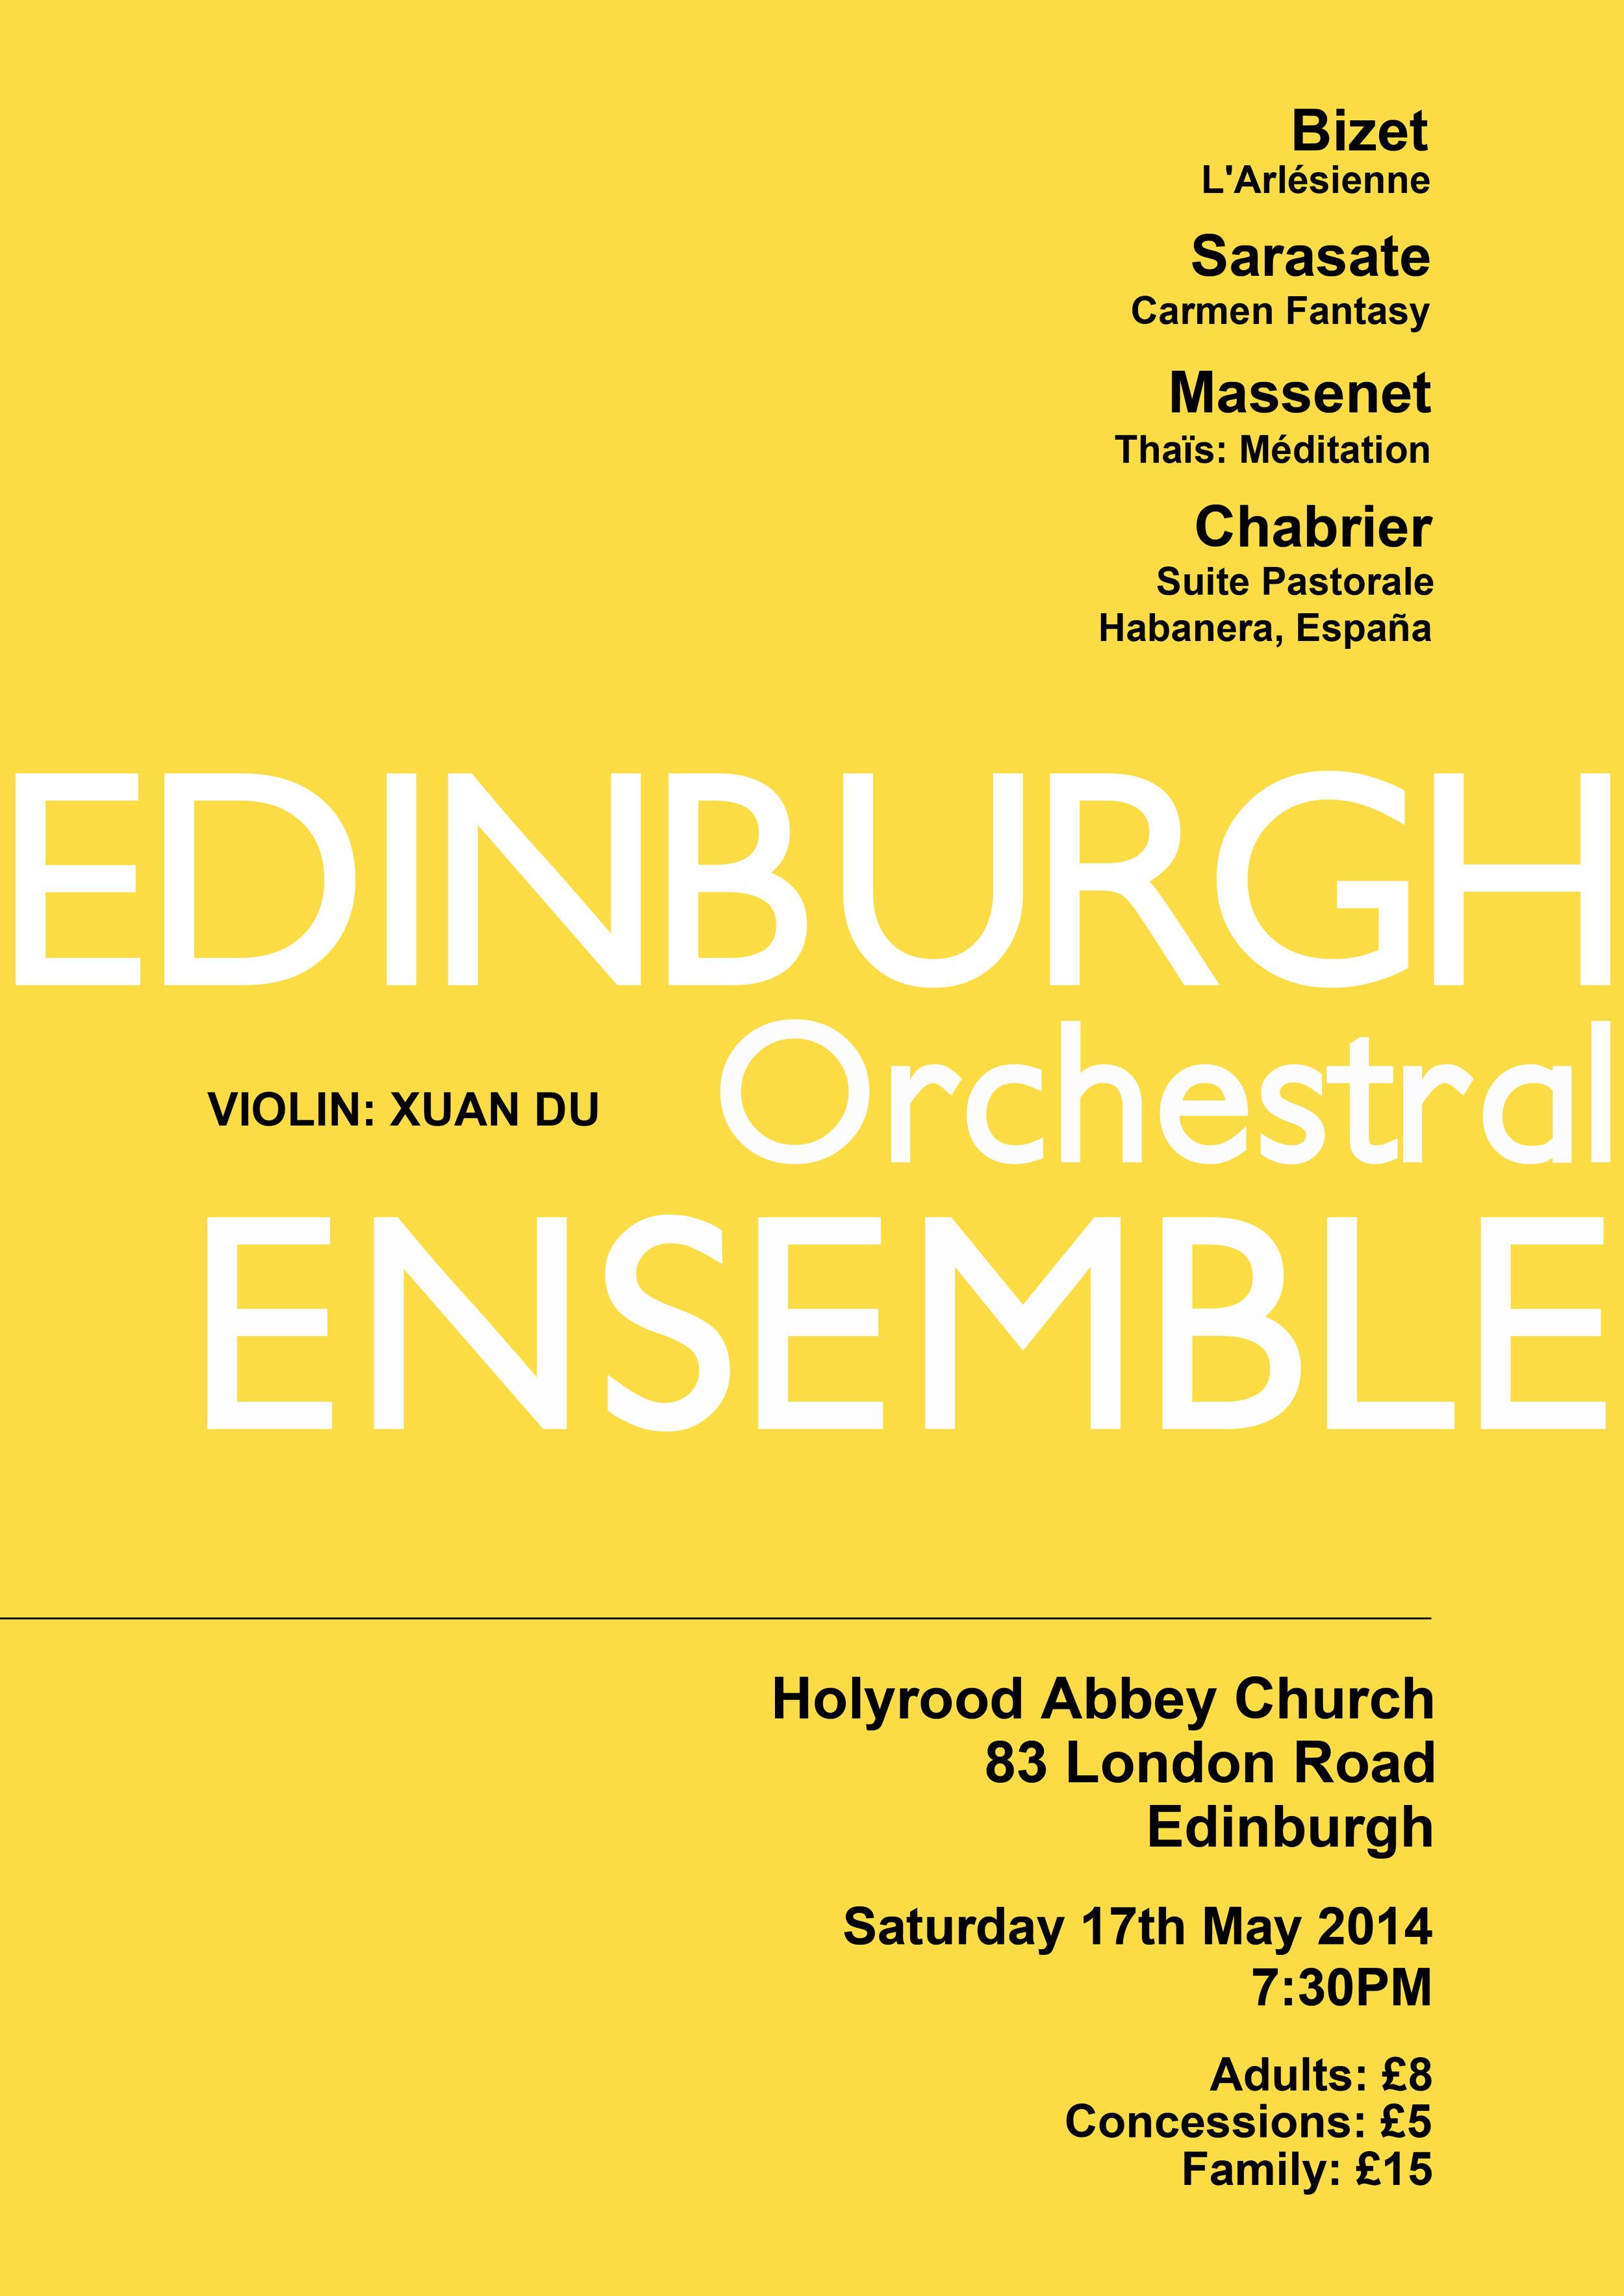 concert-poster-May-2014.jpg